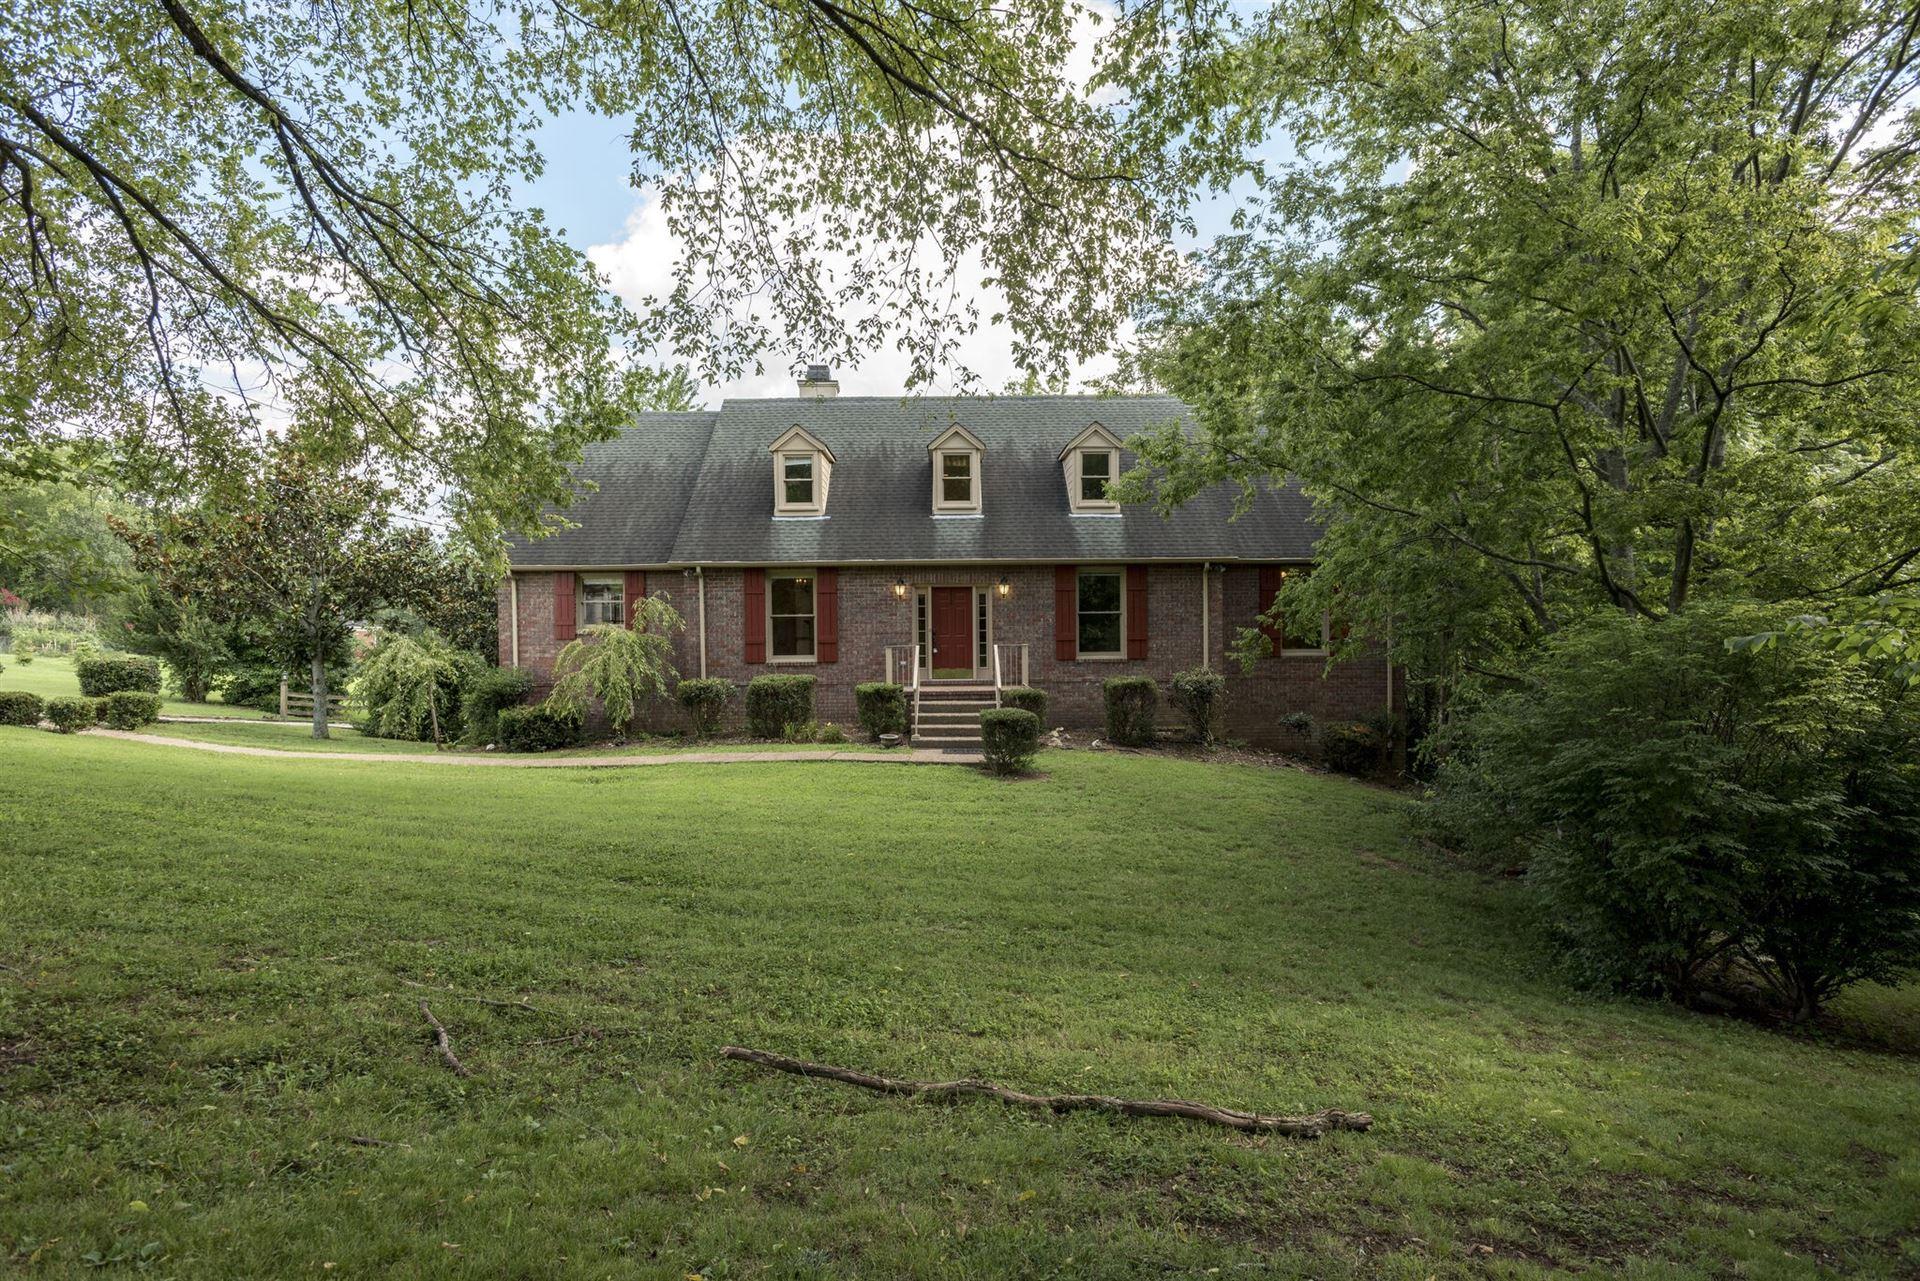 Photo of 9303 Saratoga Pl, Brentwood, TN 37027 (MLS # 2131335)